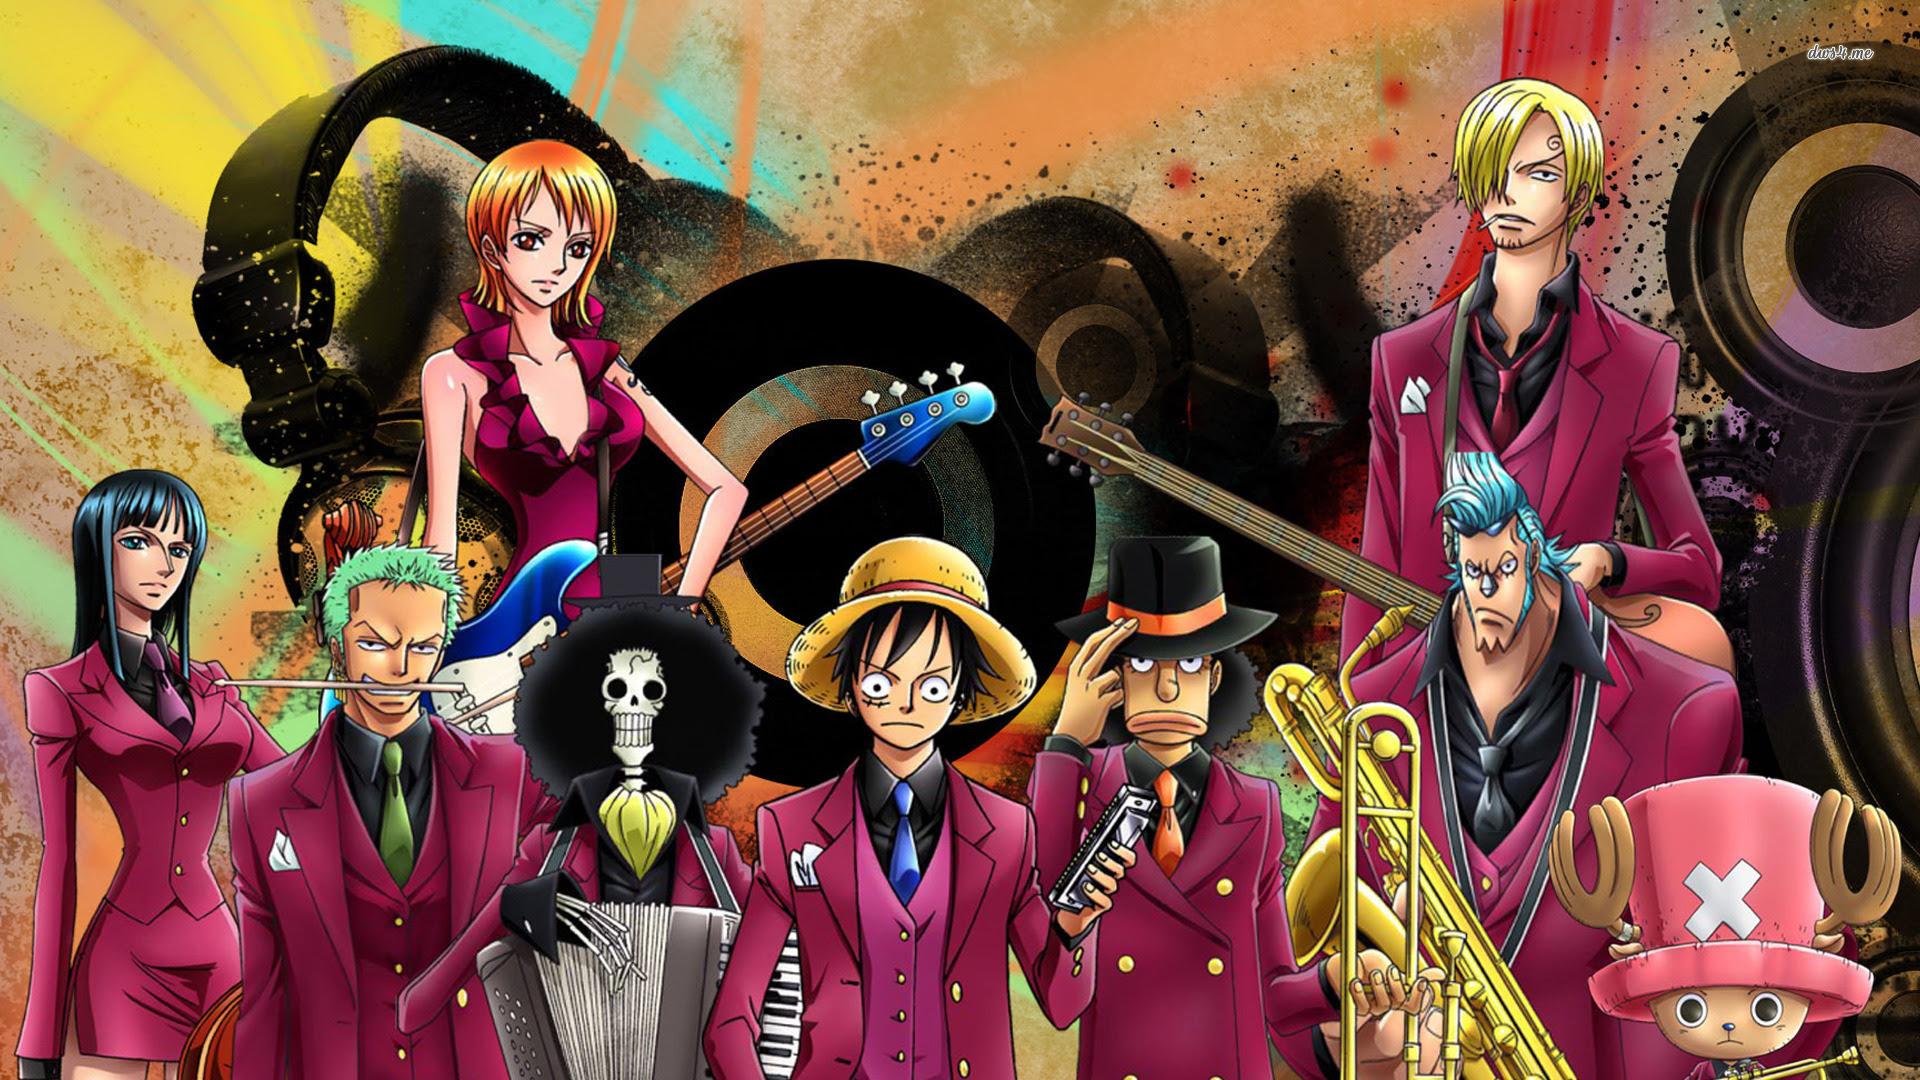 Description Cool One Piece Wallpaper Is A Hi Res Wallpaper For Pc